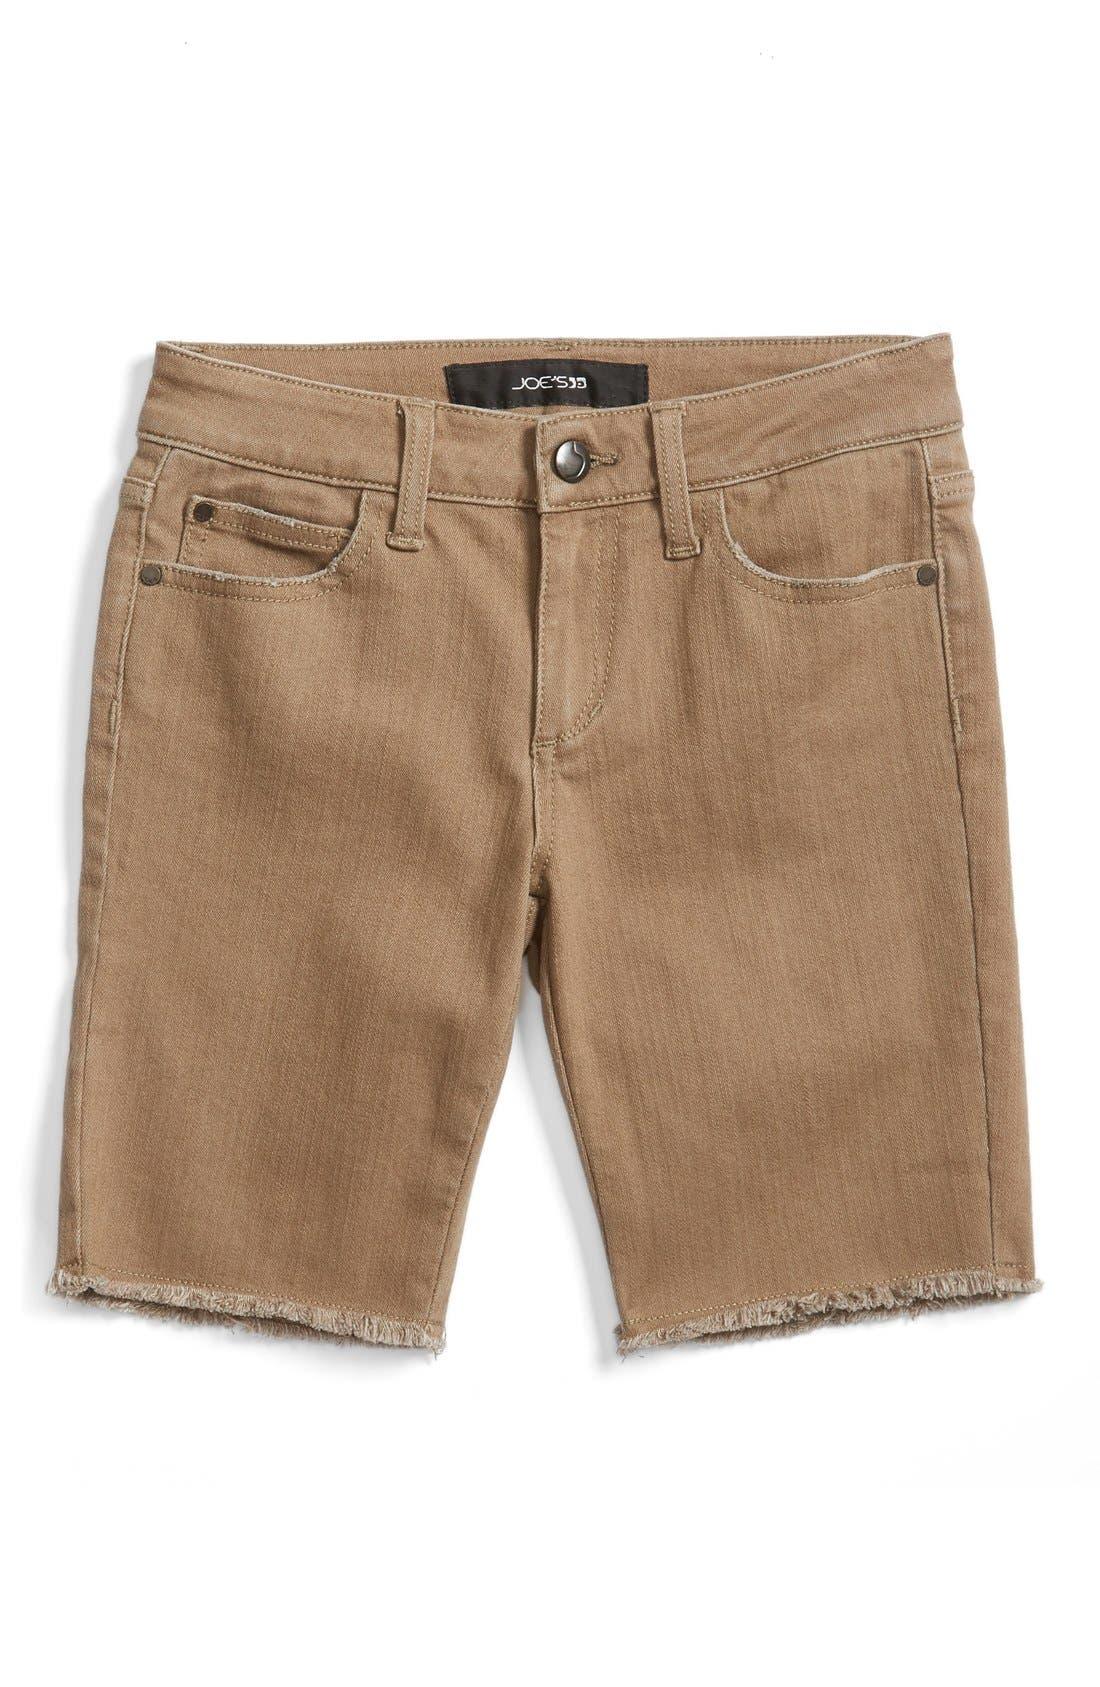 Alternate Image 1 Selected - Joe's Frayed Hem Bermuda Shorts (Toddler Boys & Little Boys)